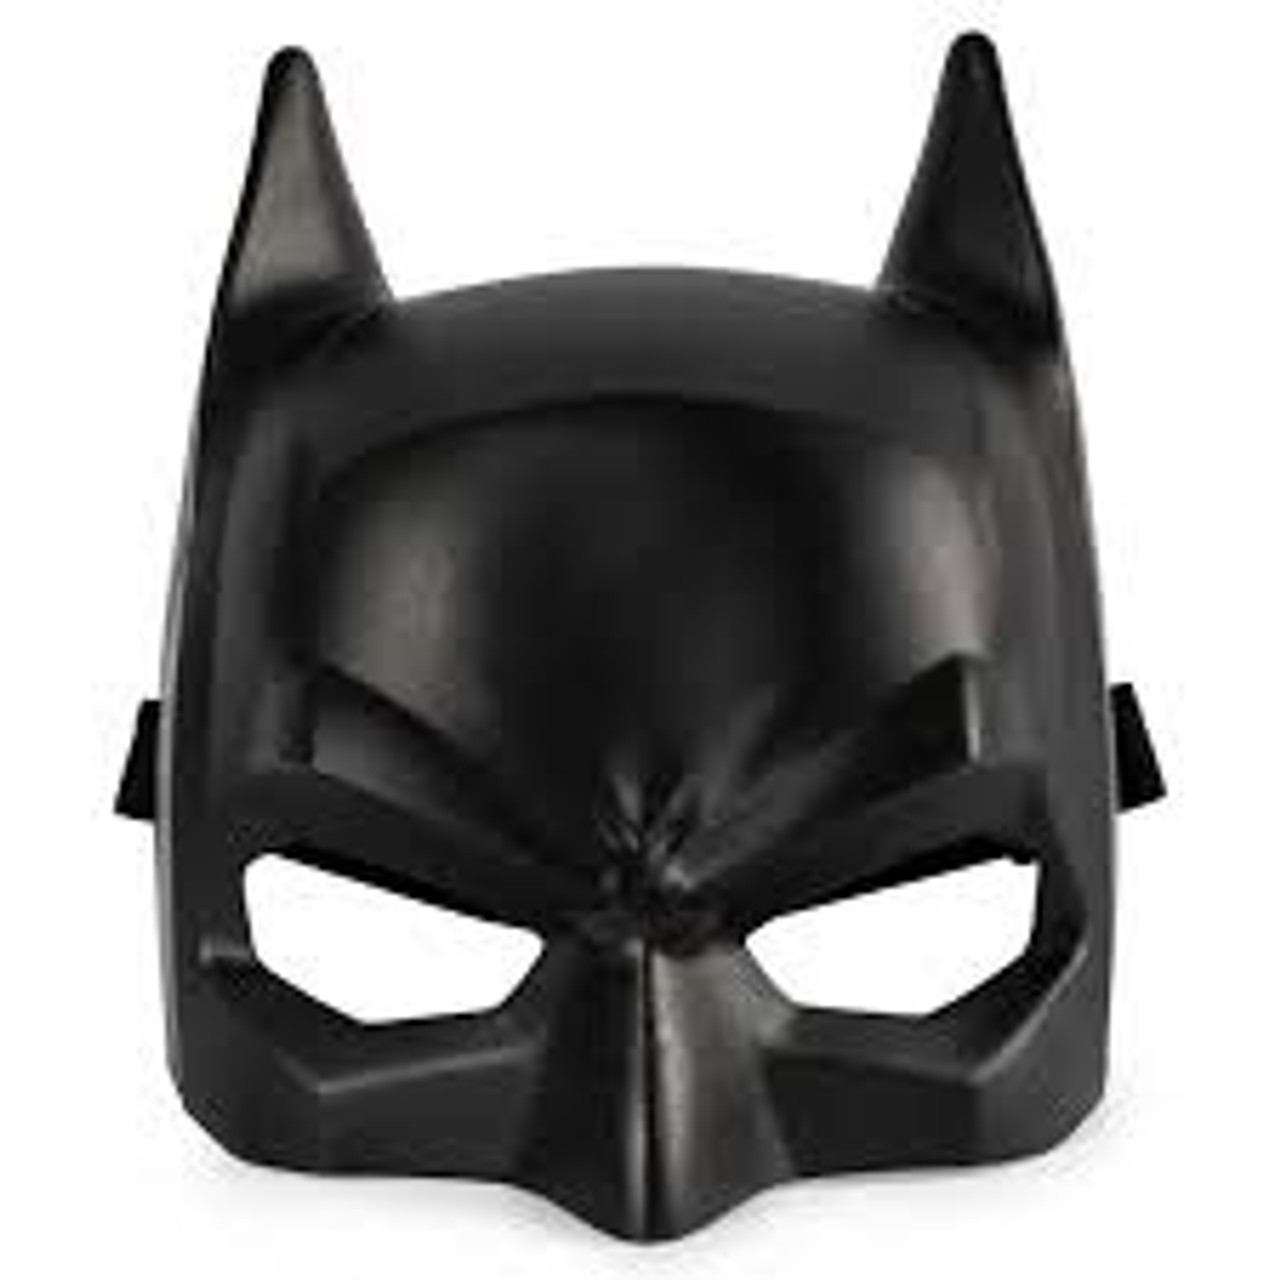 DC BATMAN CAPE / MASK ASST